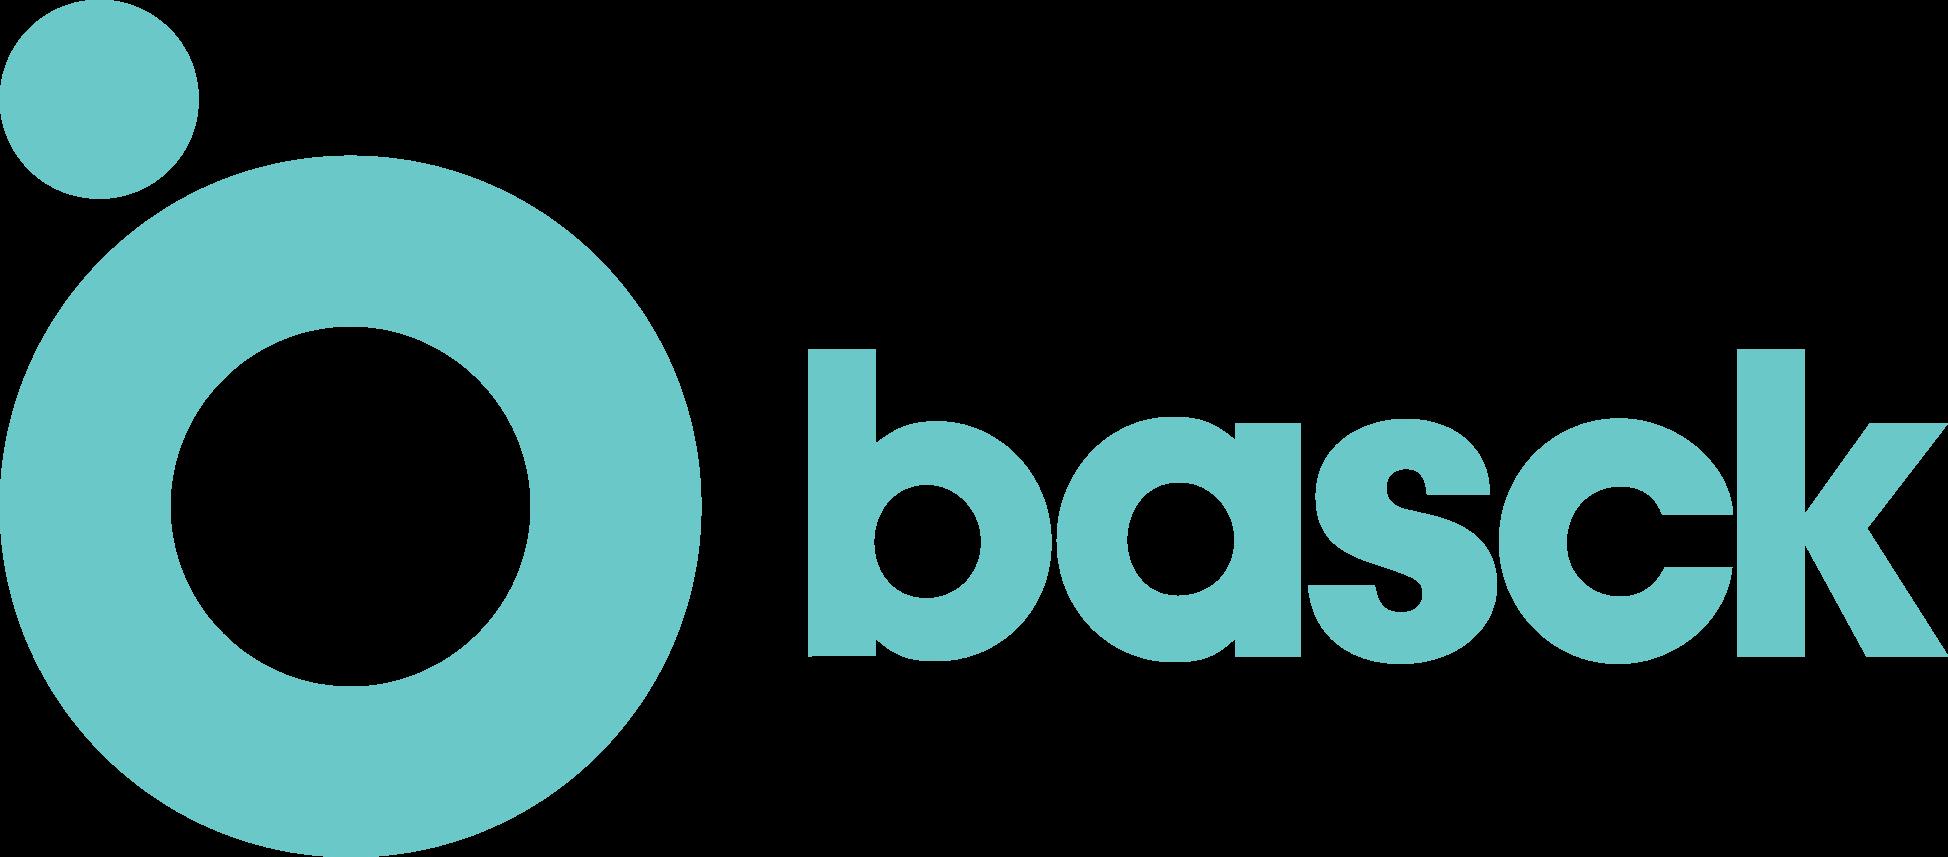 basck logo